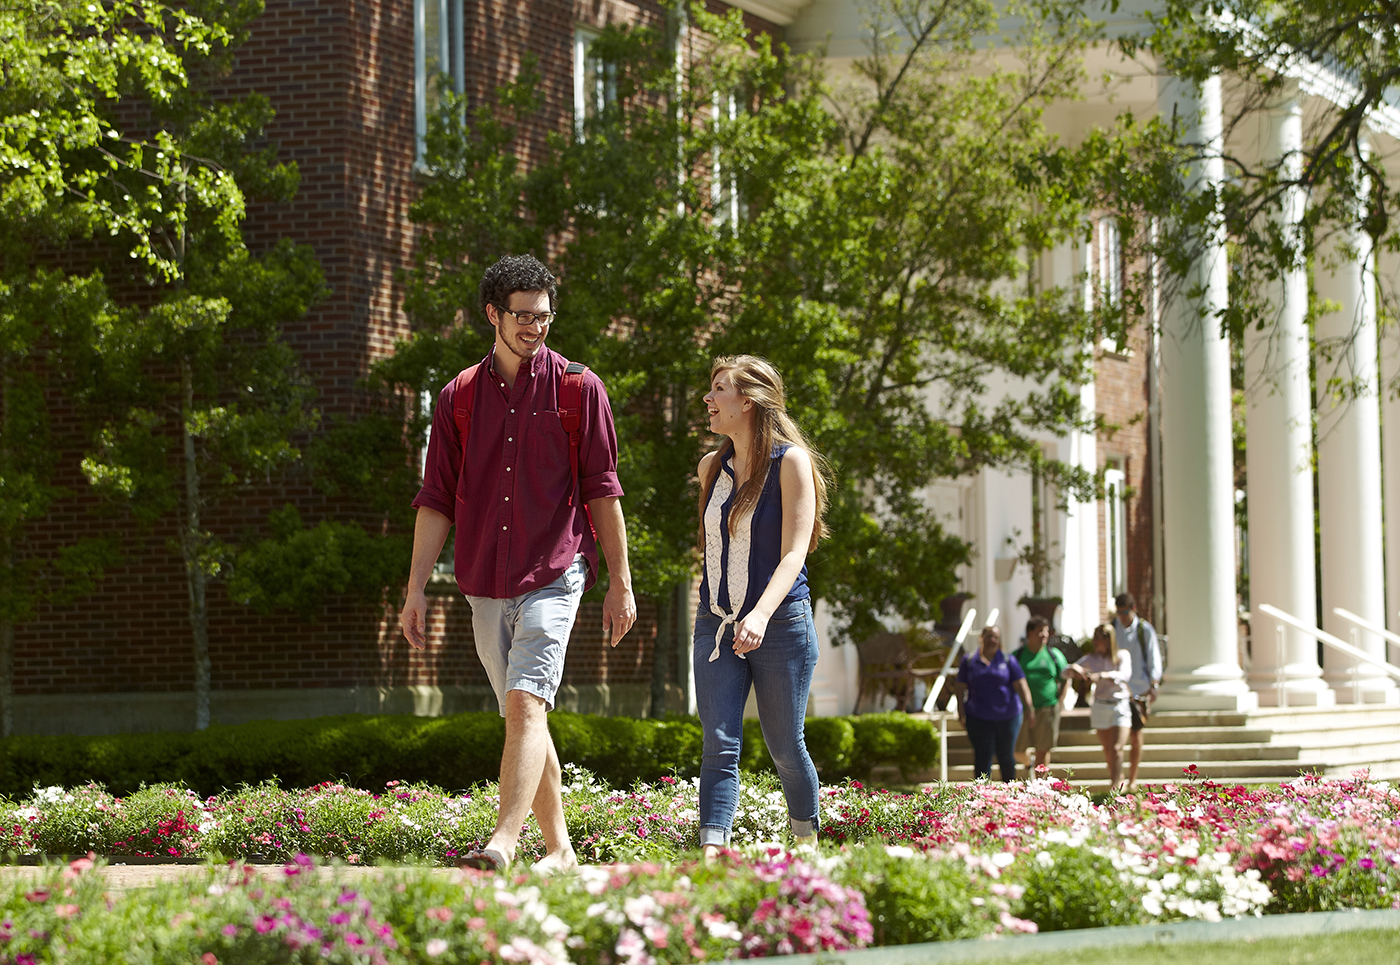 Millsaps College   Jackson   Photo courtesy of Millsaps College